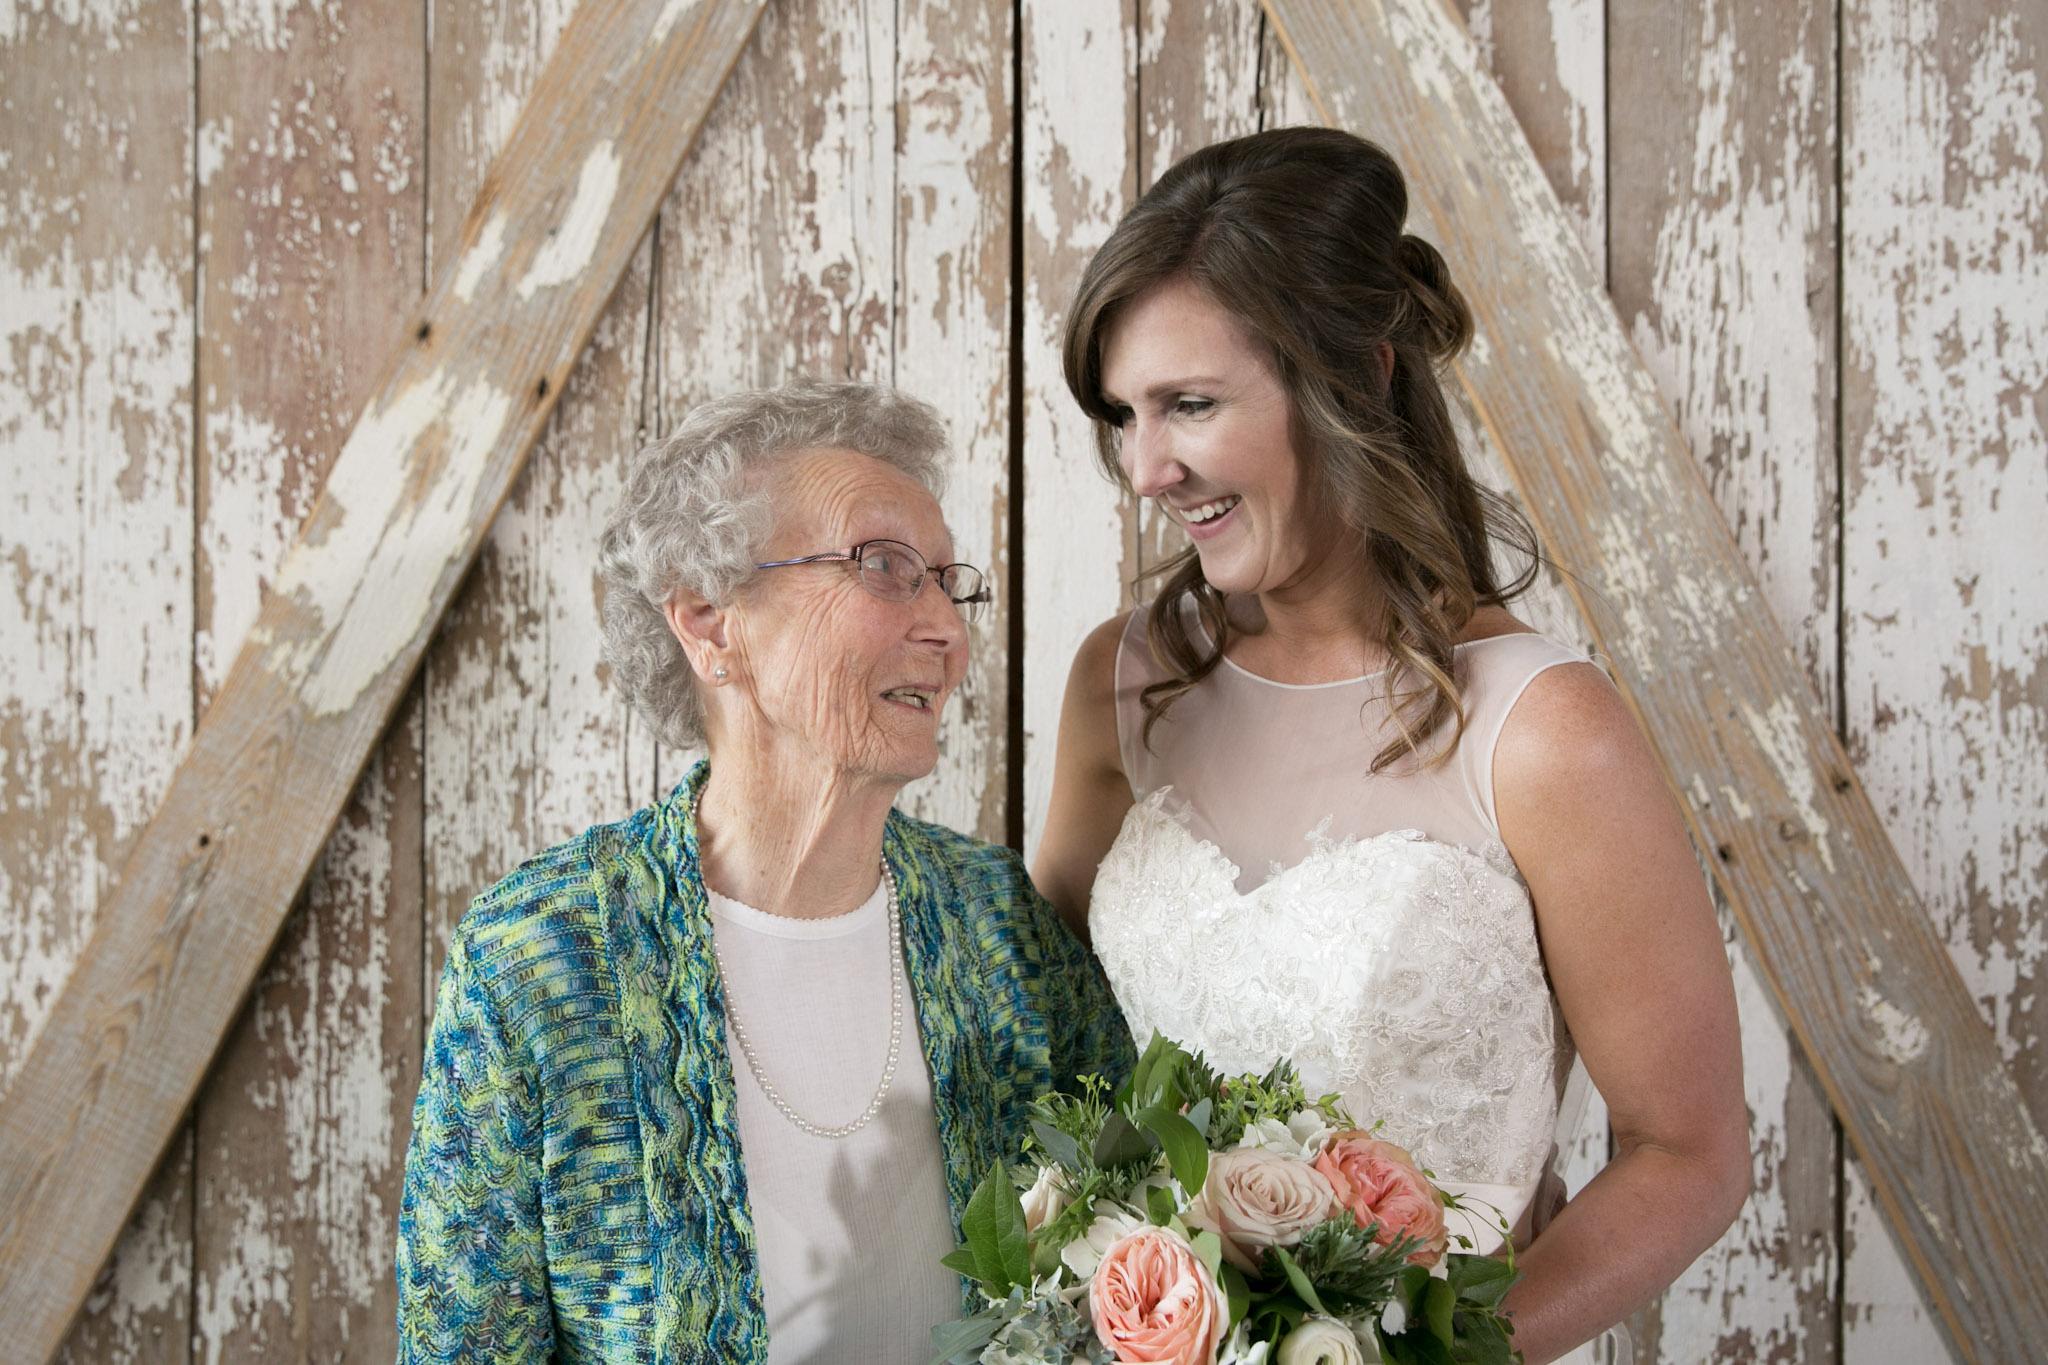 Kansas+City-Small+Wedding-Elope_Intimate_Ceremony_Mother's+Day11.jpg